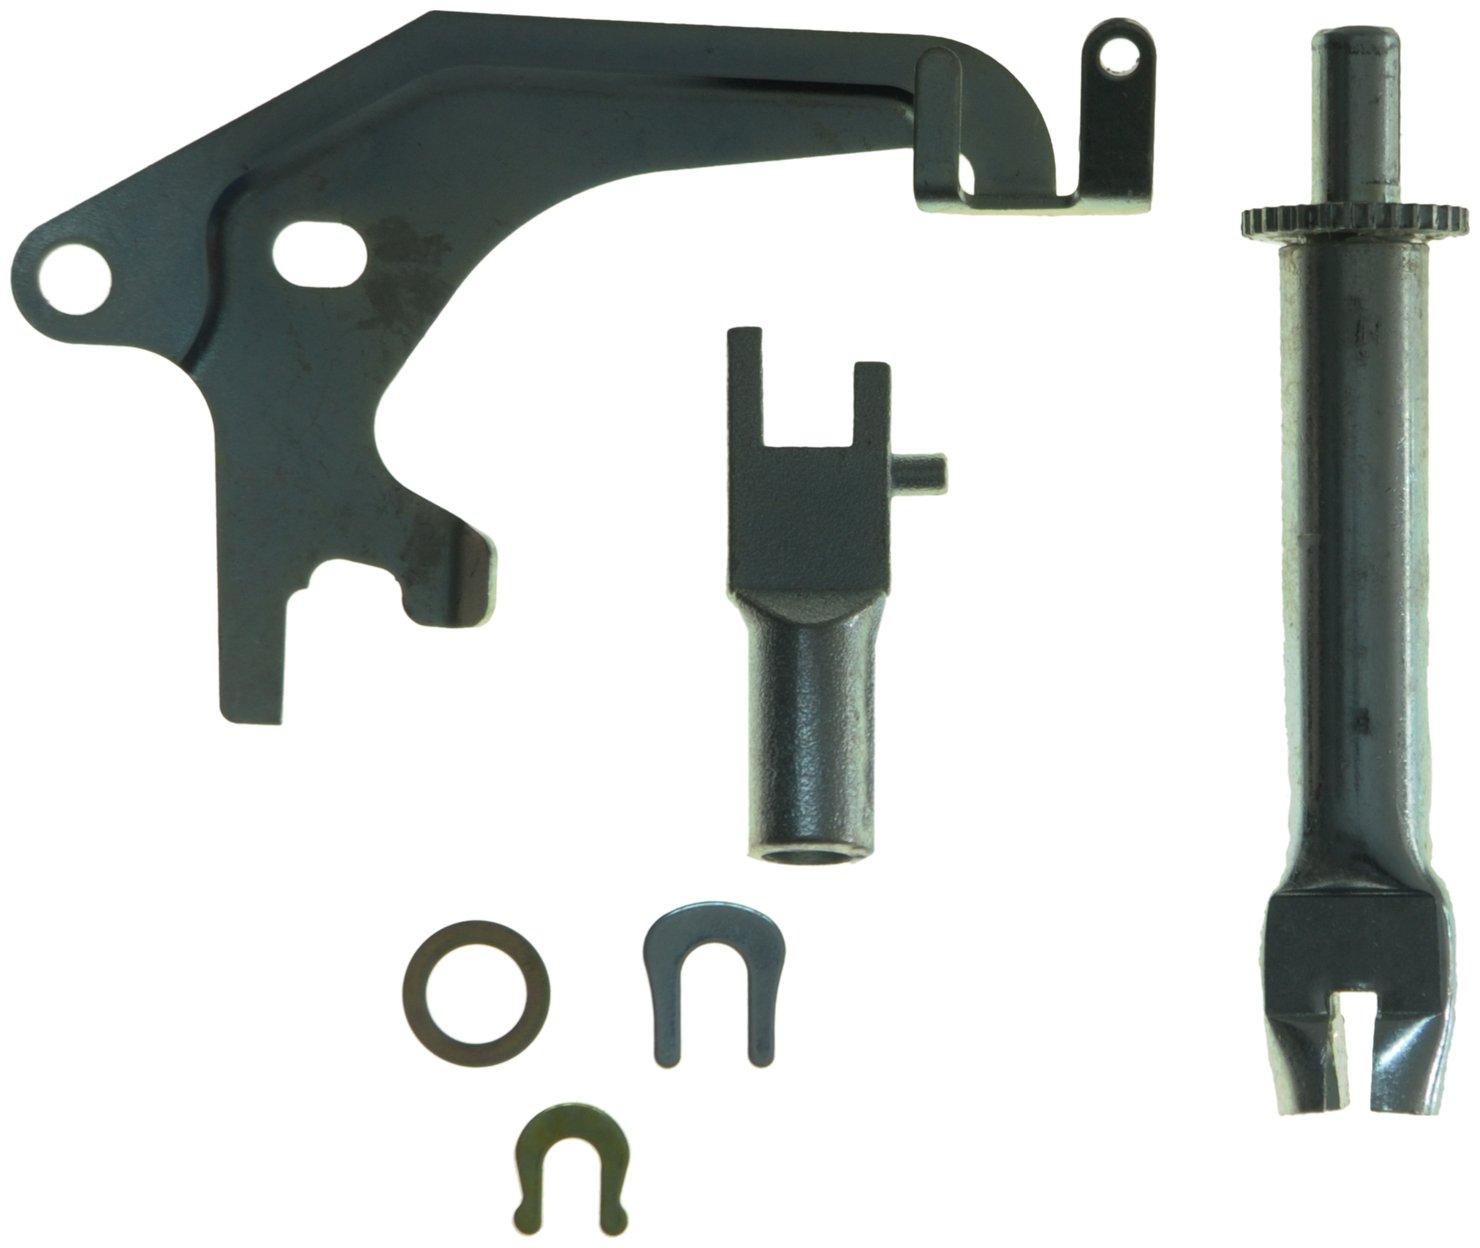 Wagner H2755 Drum Brake Self Adjuster Repair Kit, Rear Left by Wagner